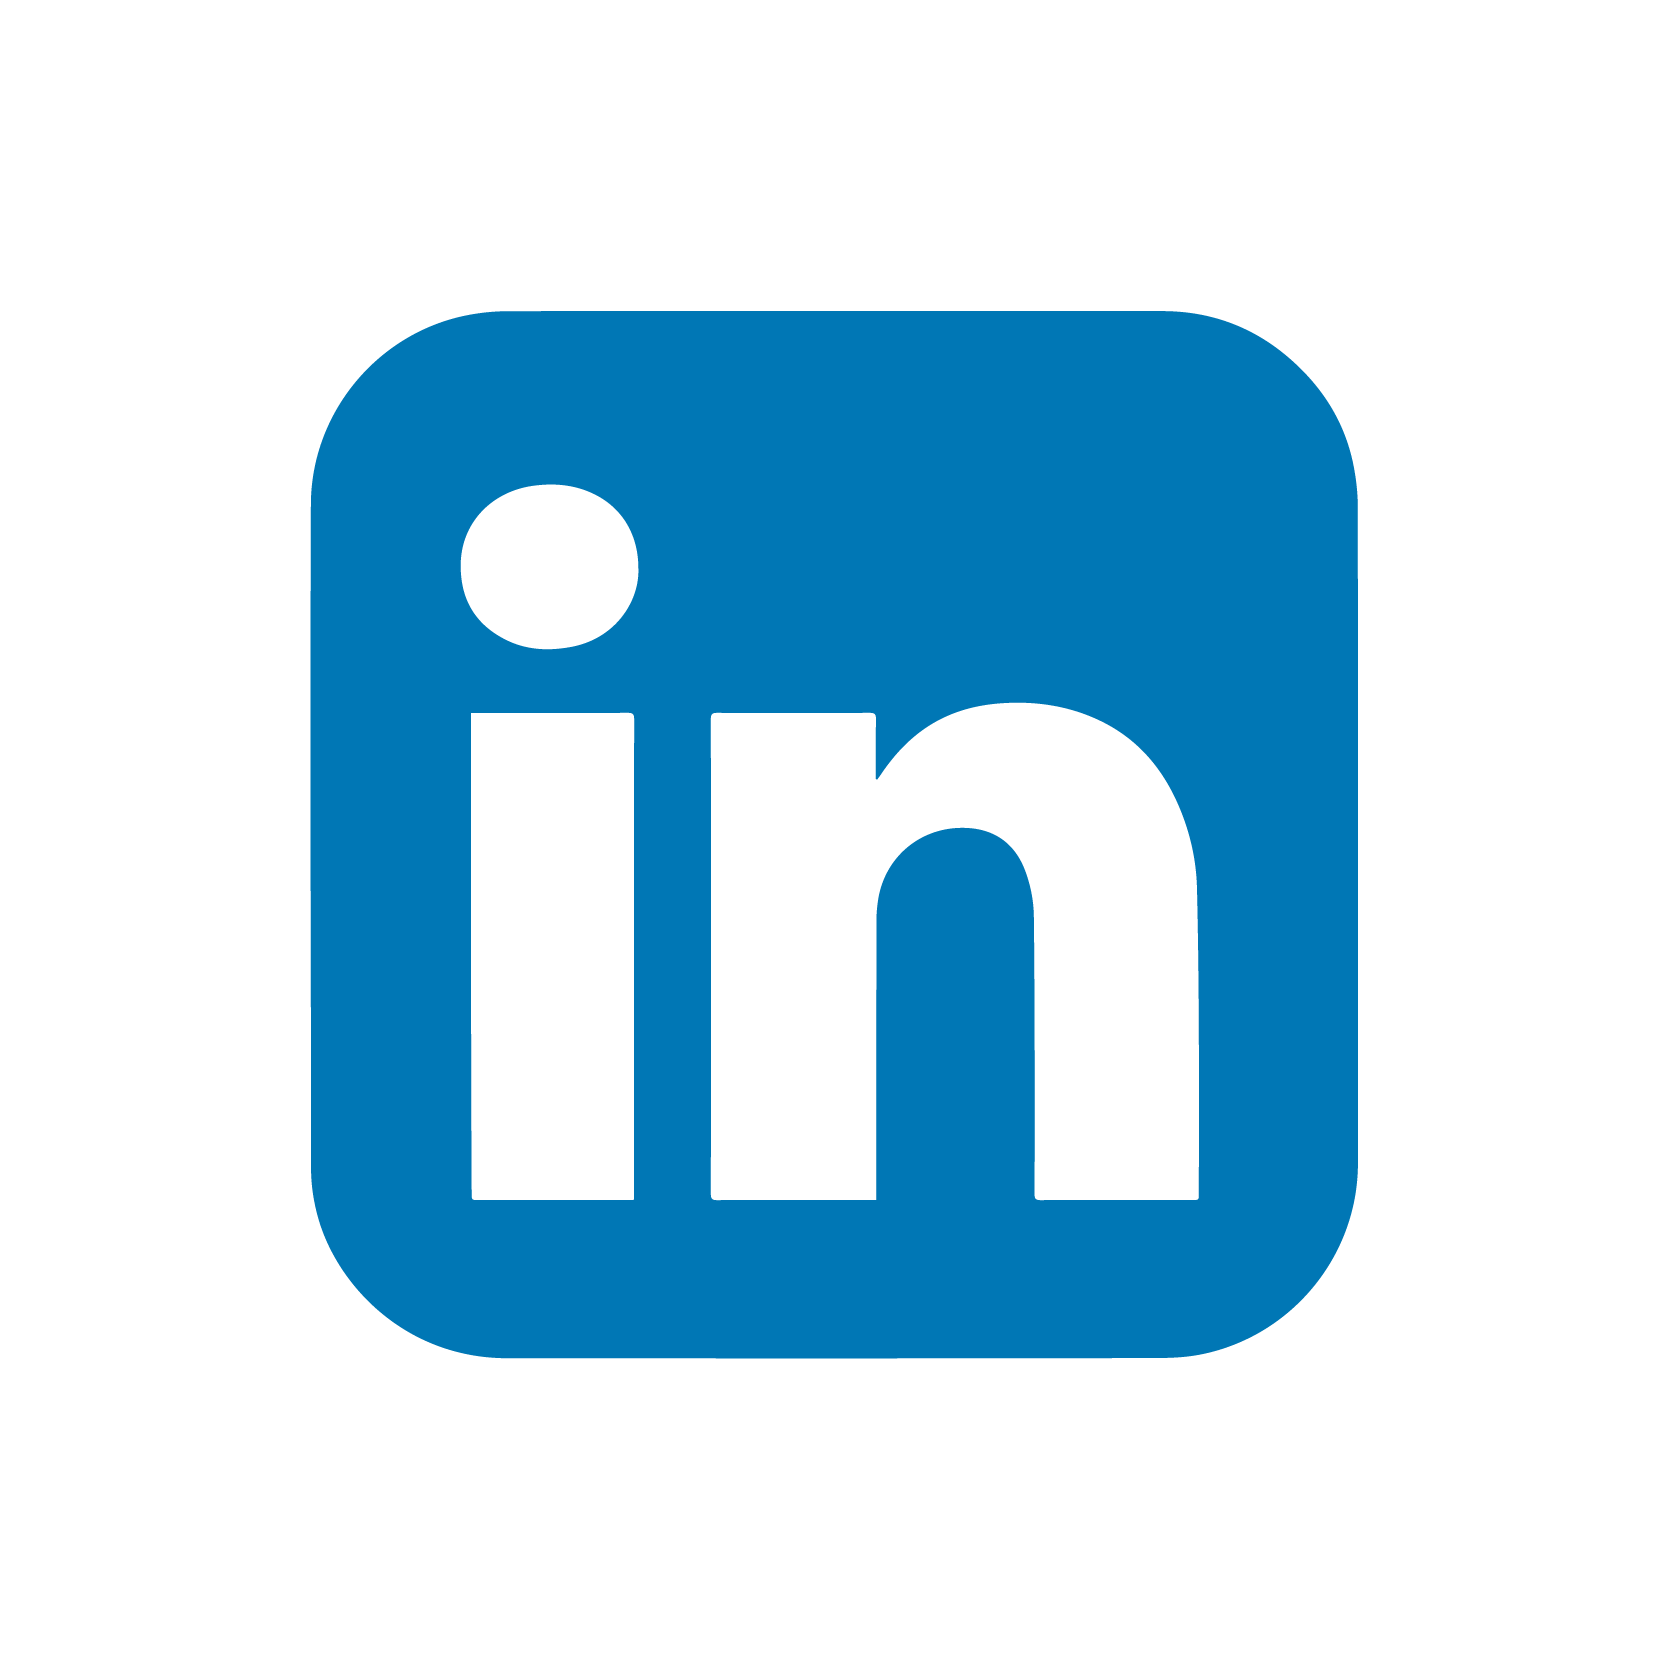 Follow Ben on Linkedin